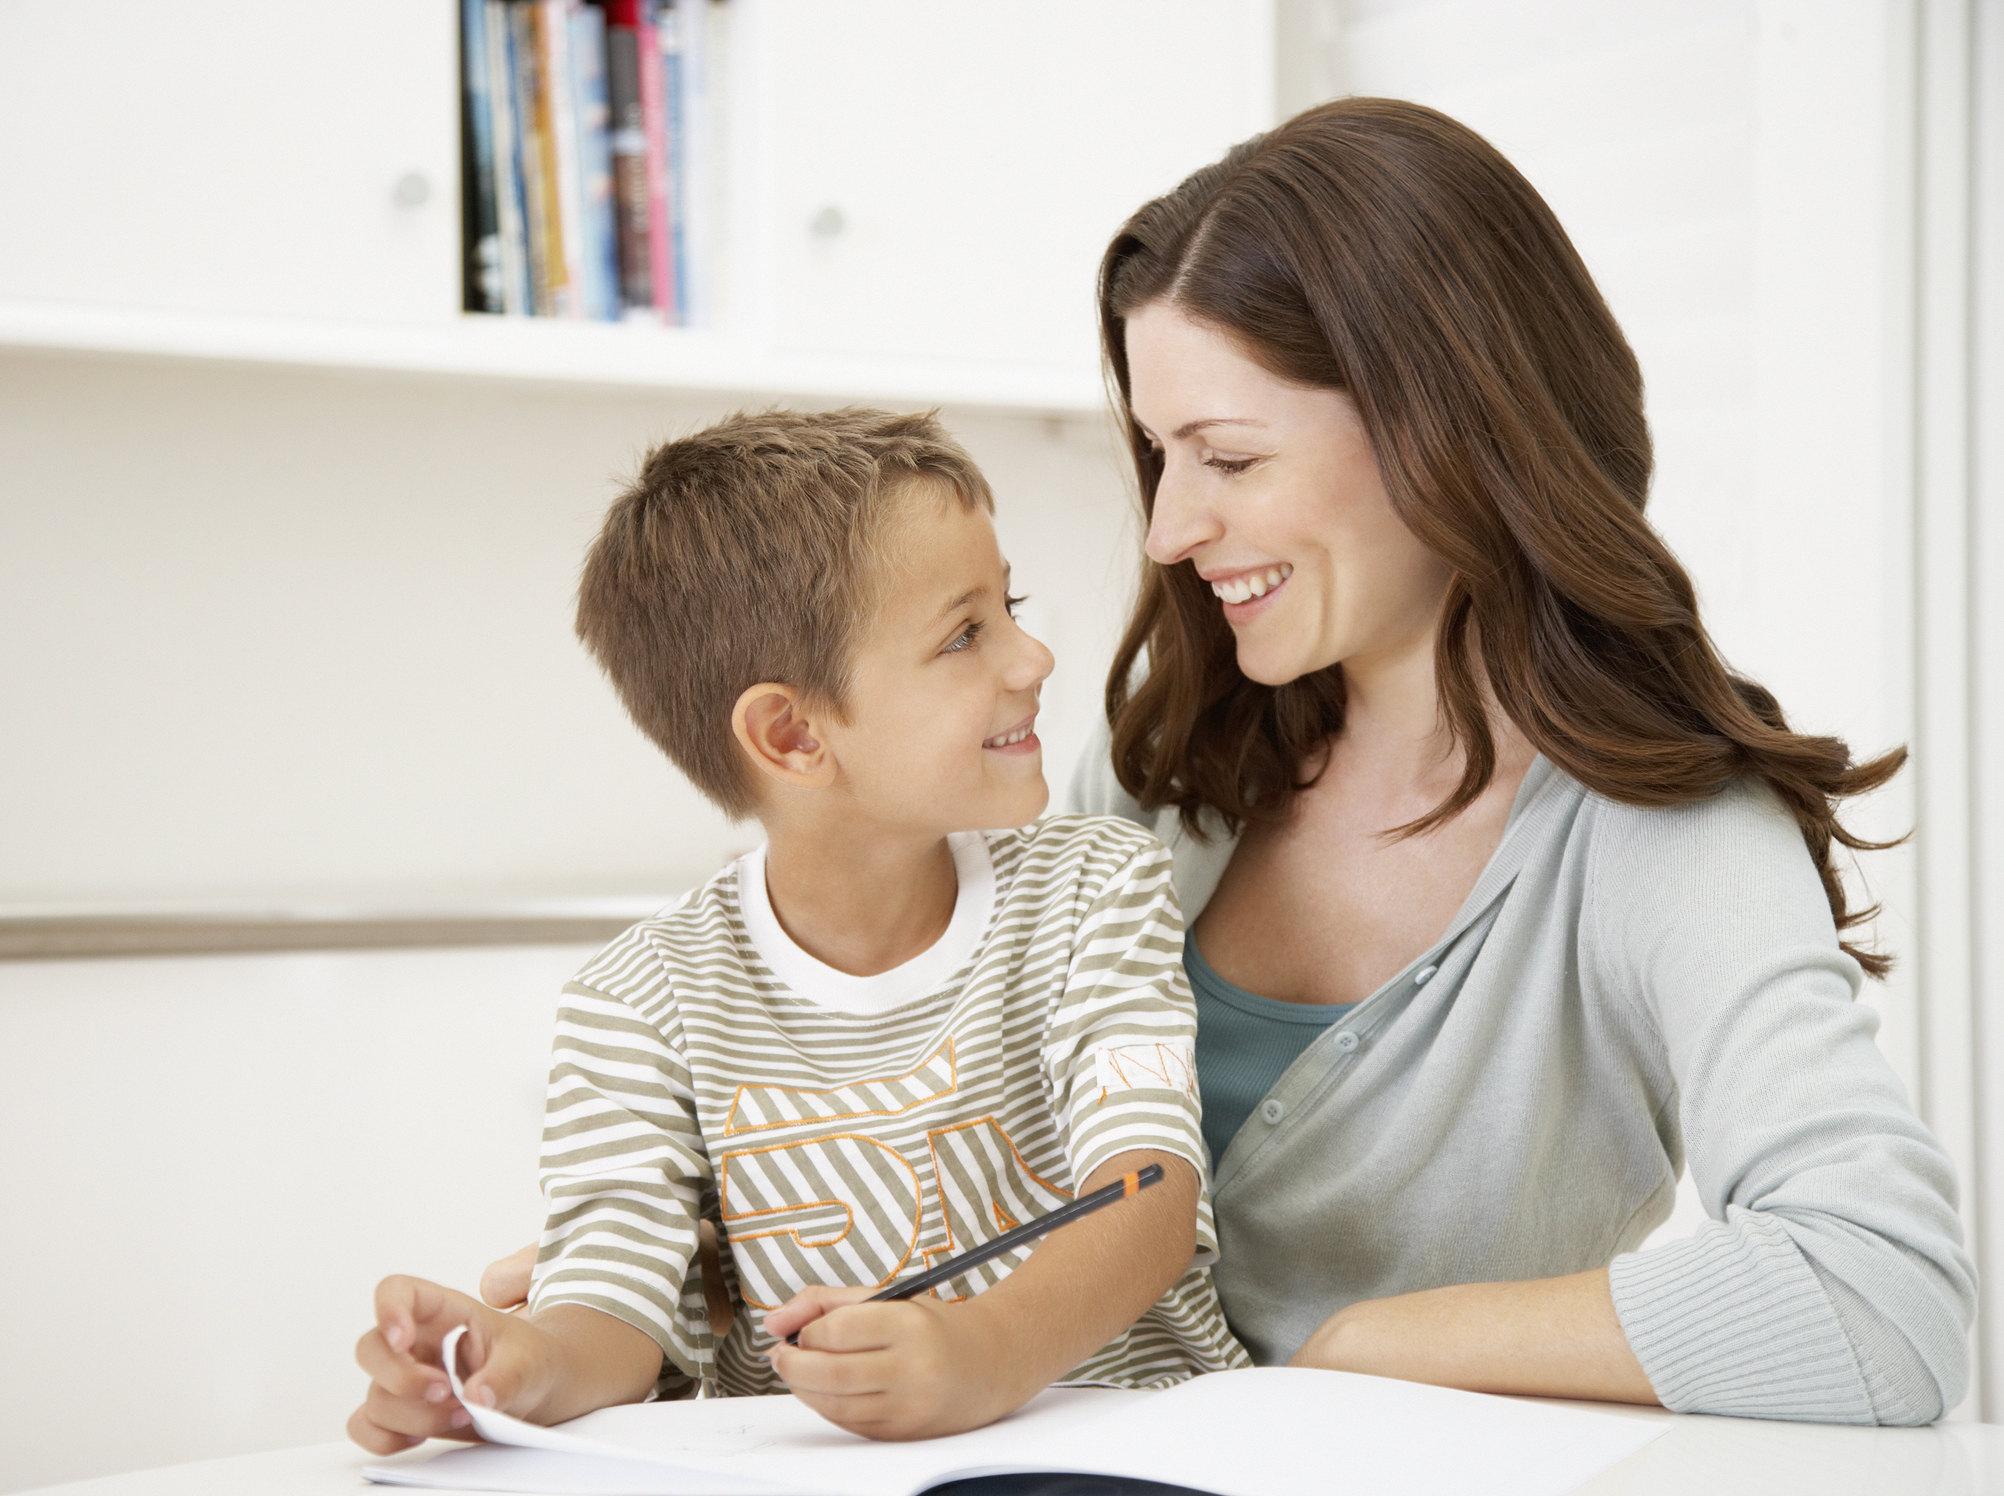 Материнский ум определяет интеллект ребенка